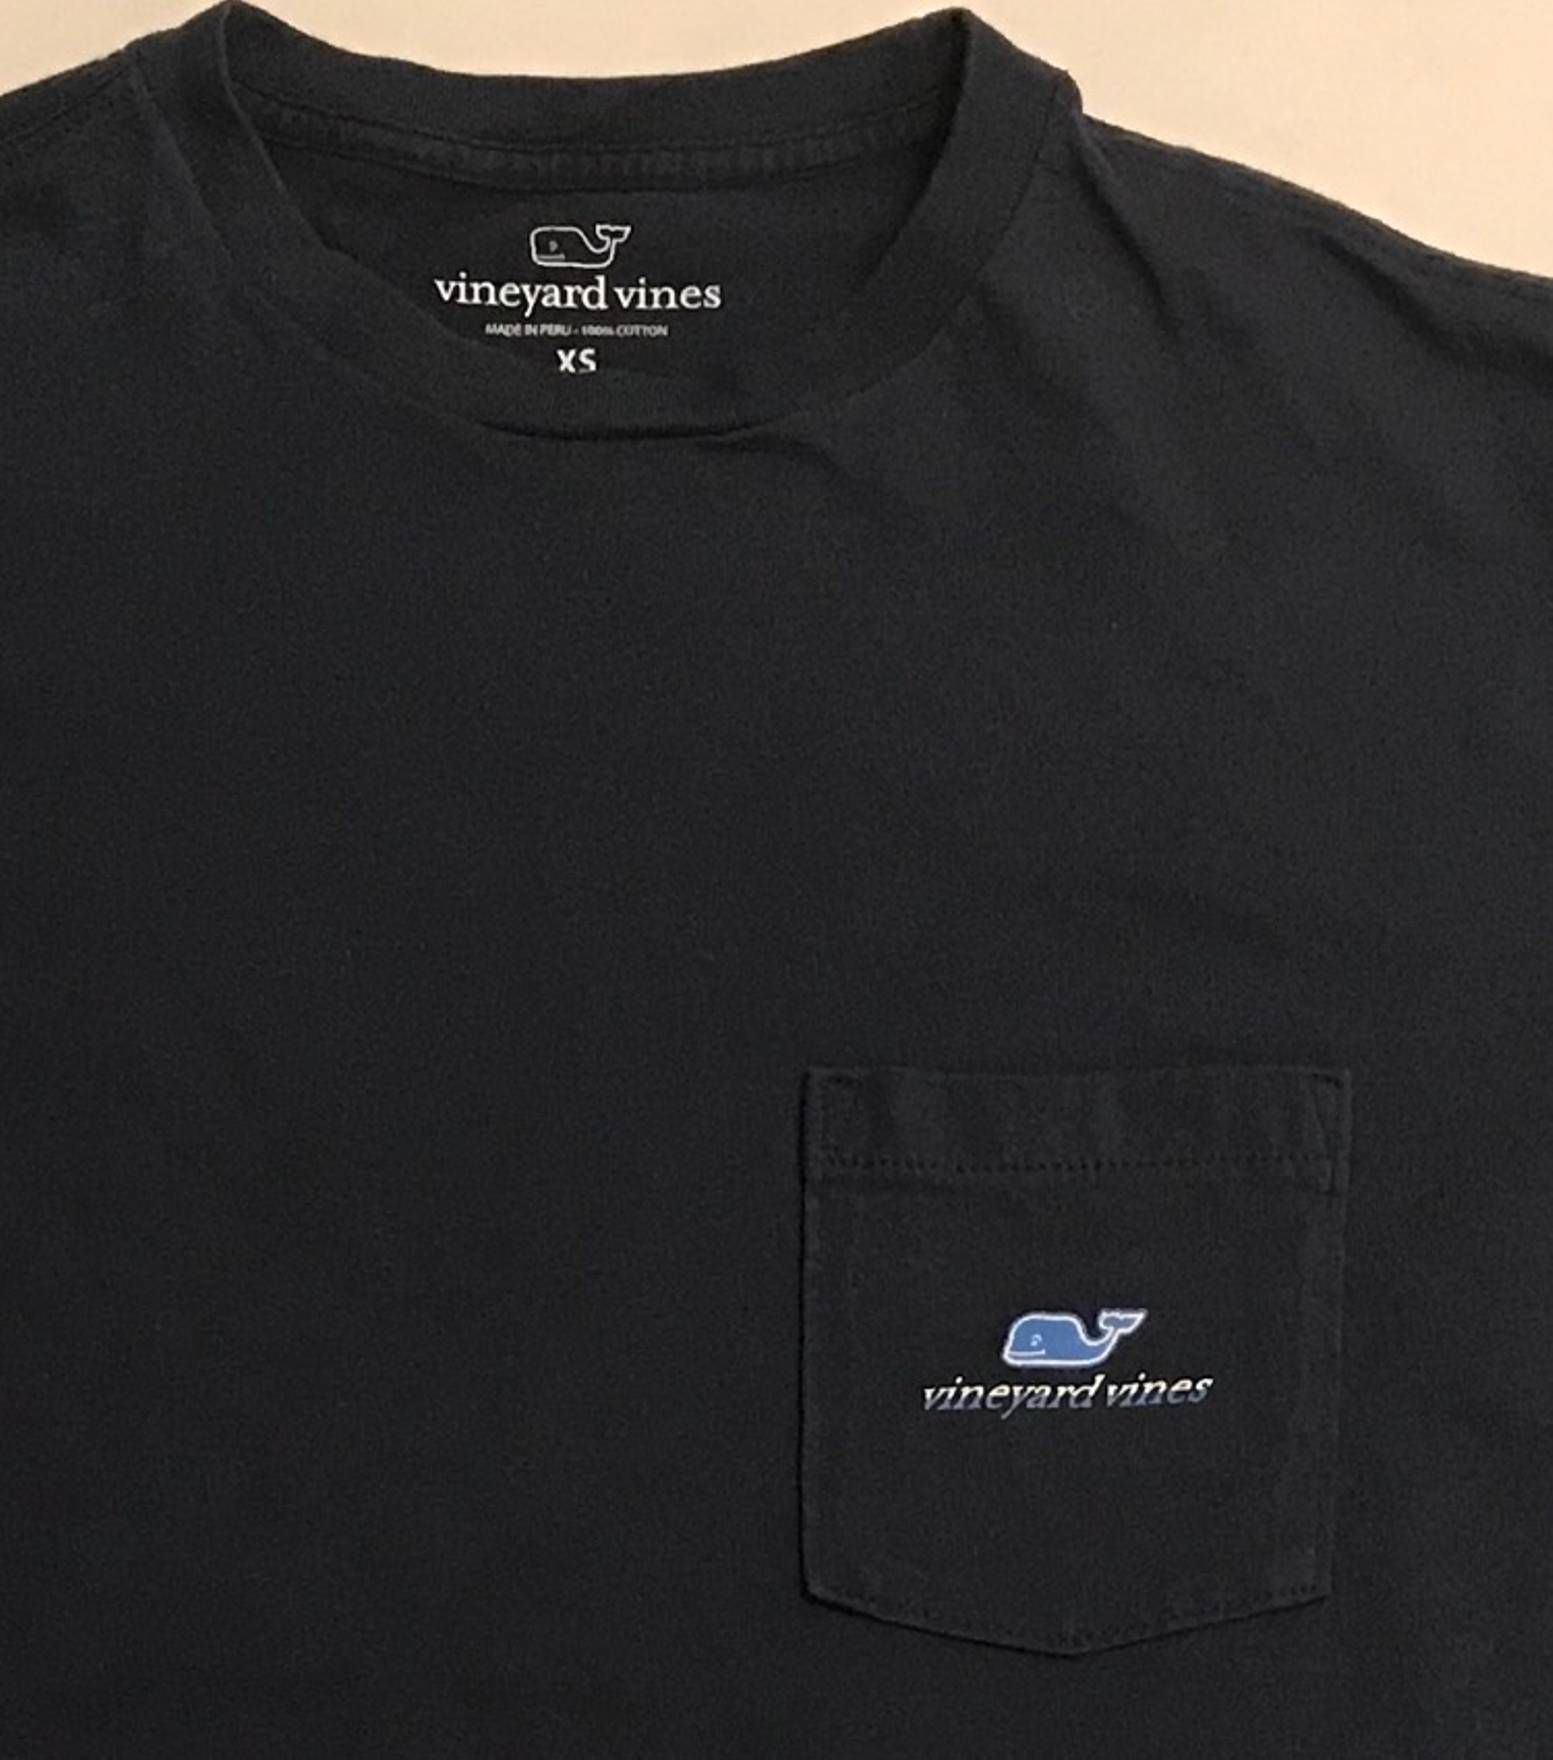 418ca11c31e152 Vineyard Vines Vineyard Vines Whale Logo Pocket T-Shirt Rare Football Tee  Size US XS   EU 42   0 - 2